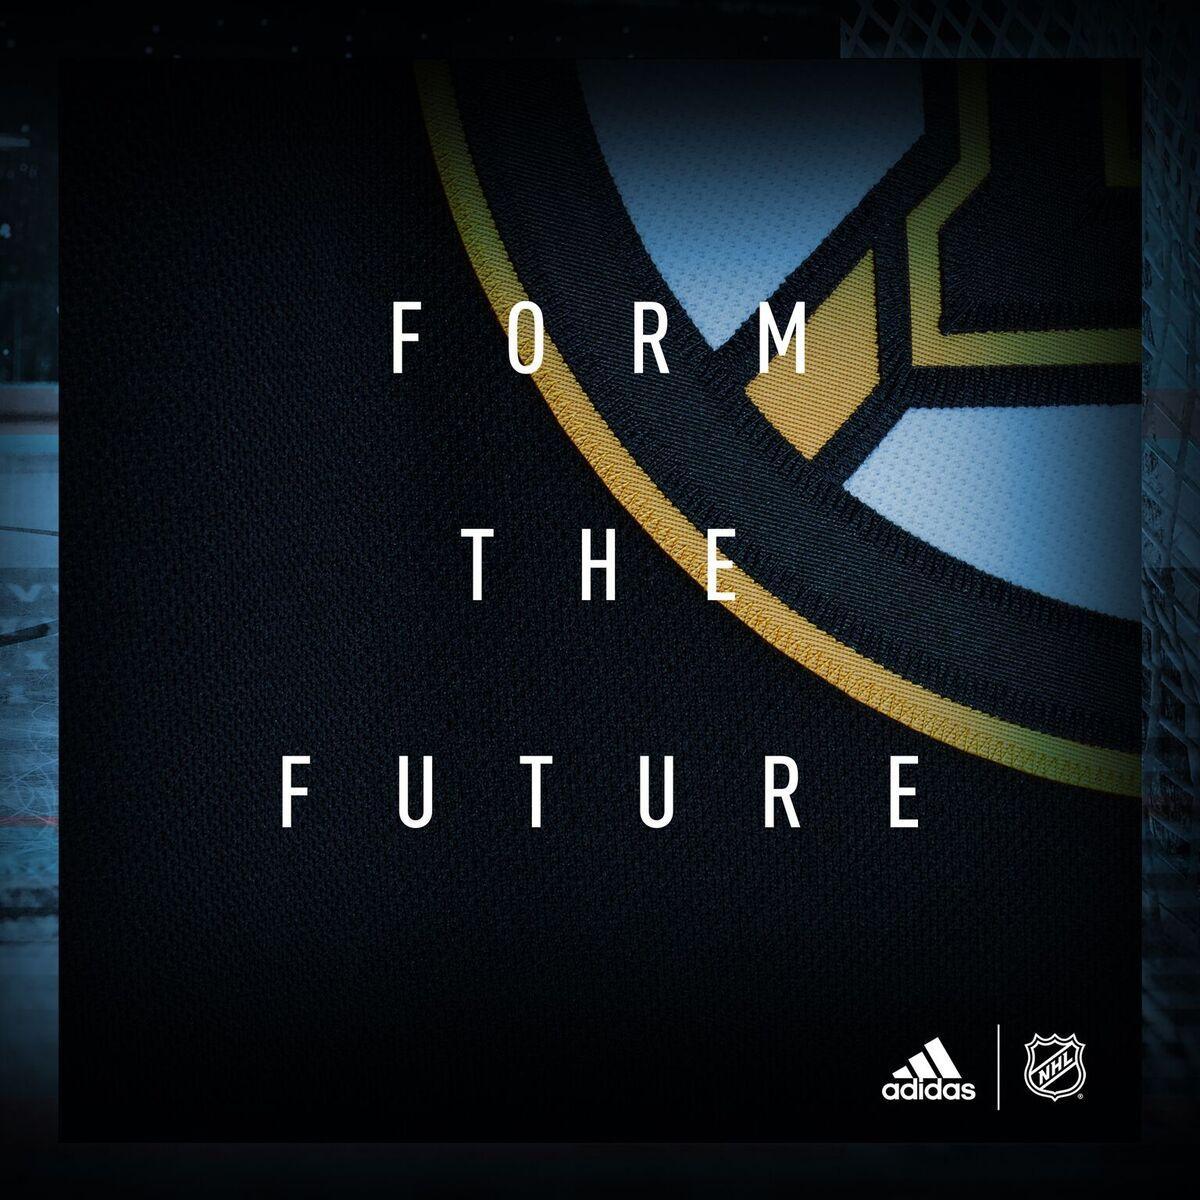 Coming soon. #FormTheFuture @adidashockey https://t.co/wrLHHYBlhr